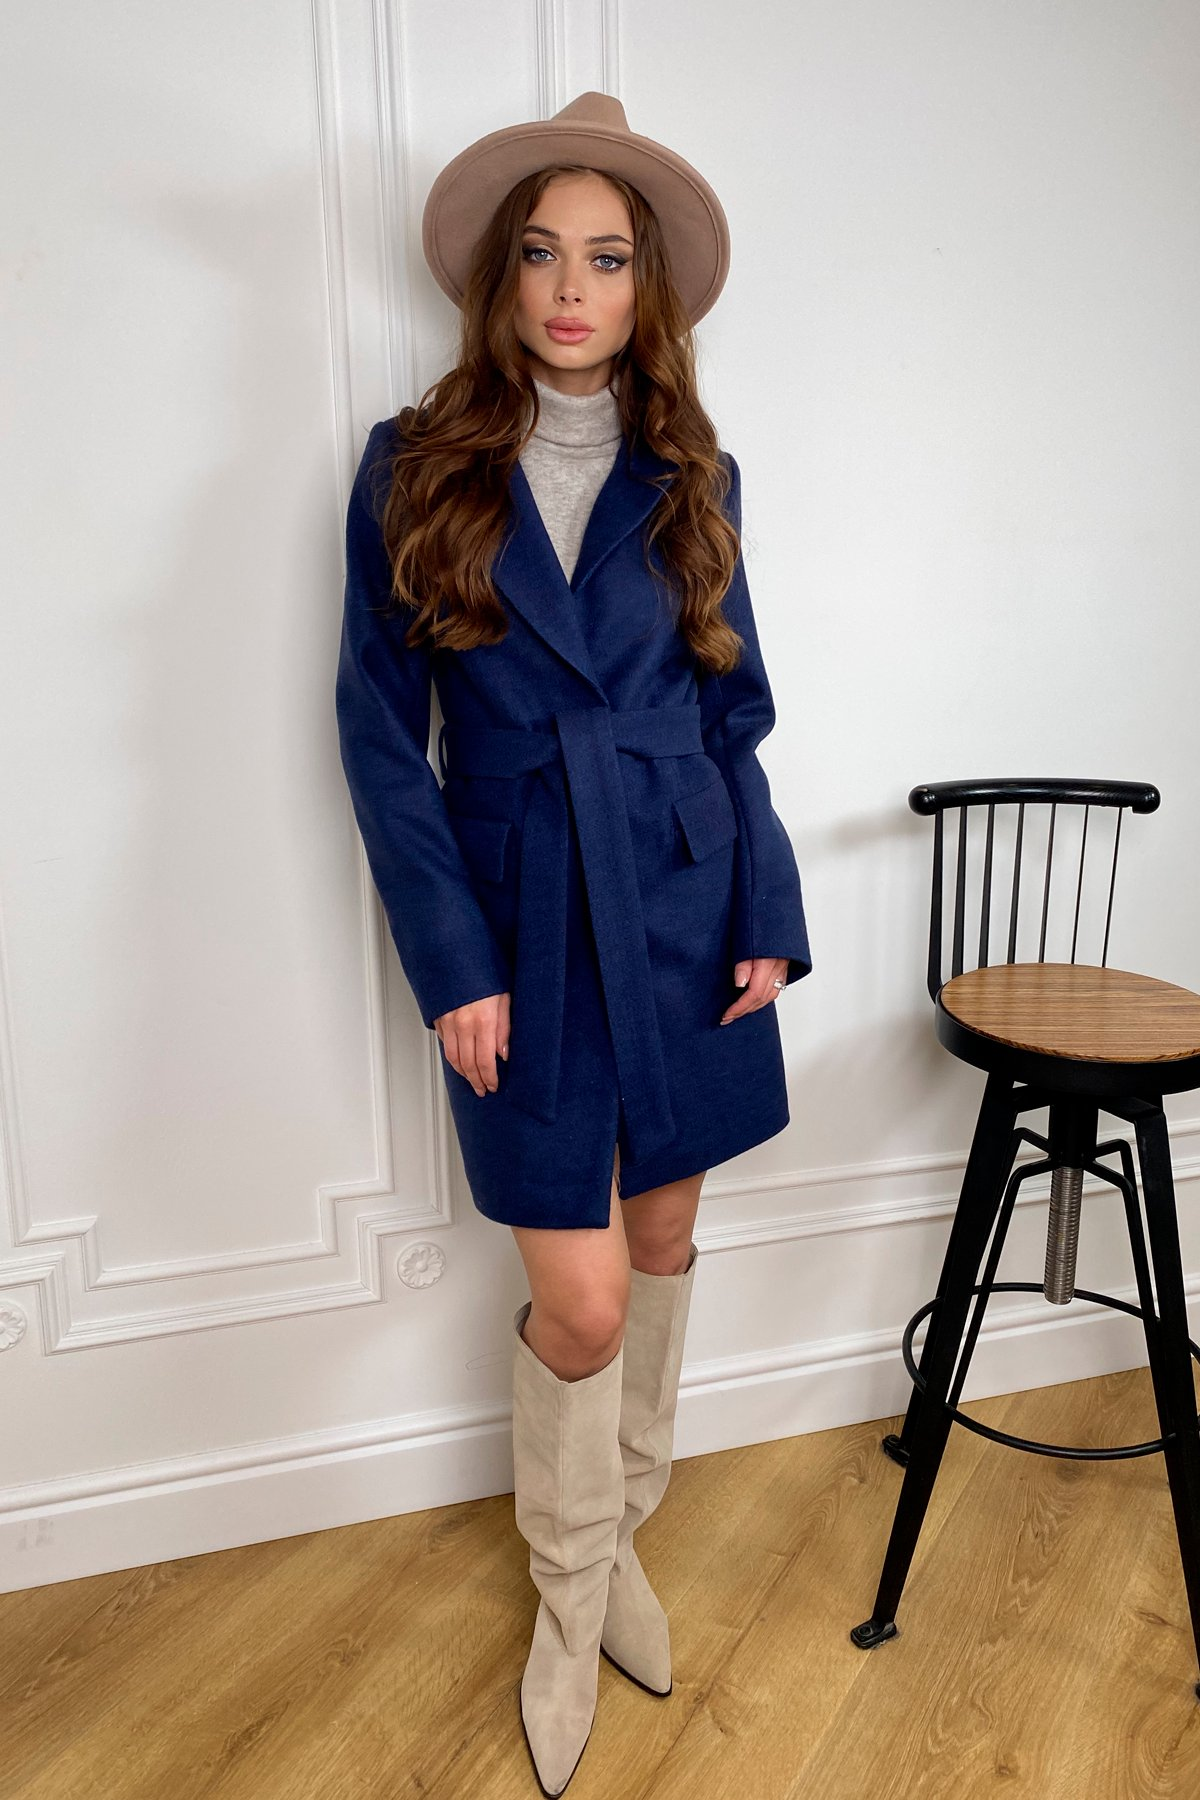 Корси кашемир меланж на трикотаже пальто 9827 АРТ. 46114 Цвет: Т.синий - фото 1, интернет магазин tm-modus.ru